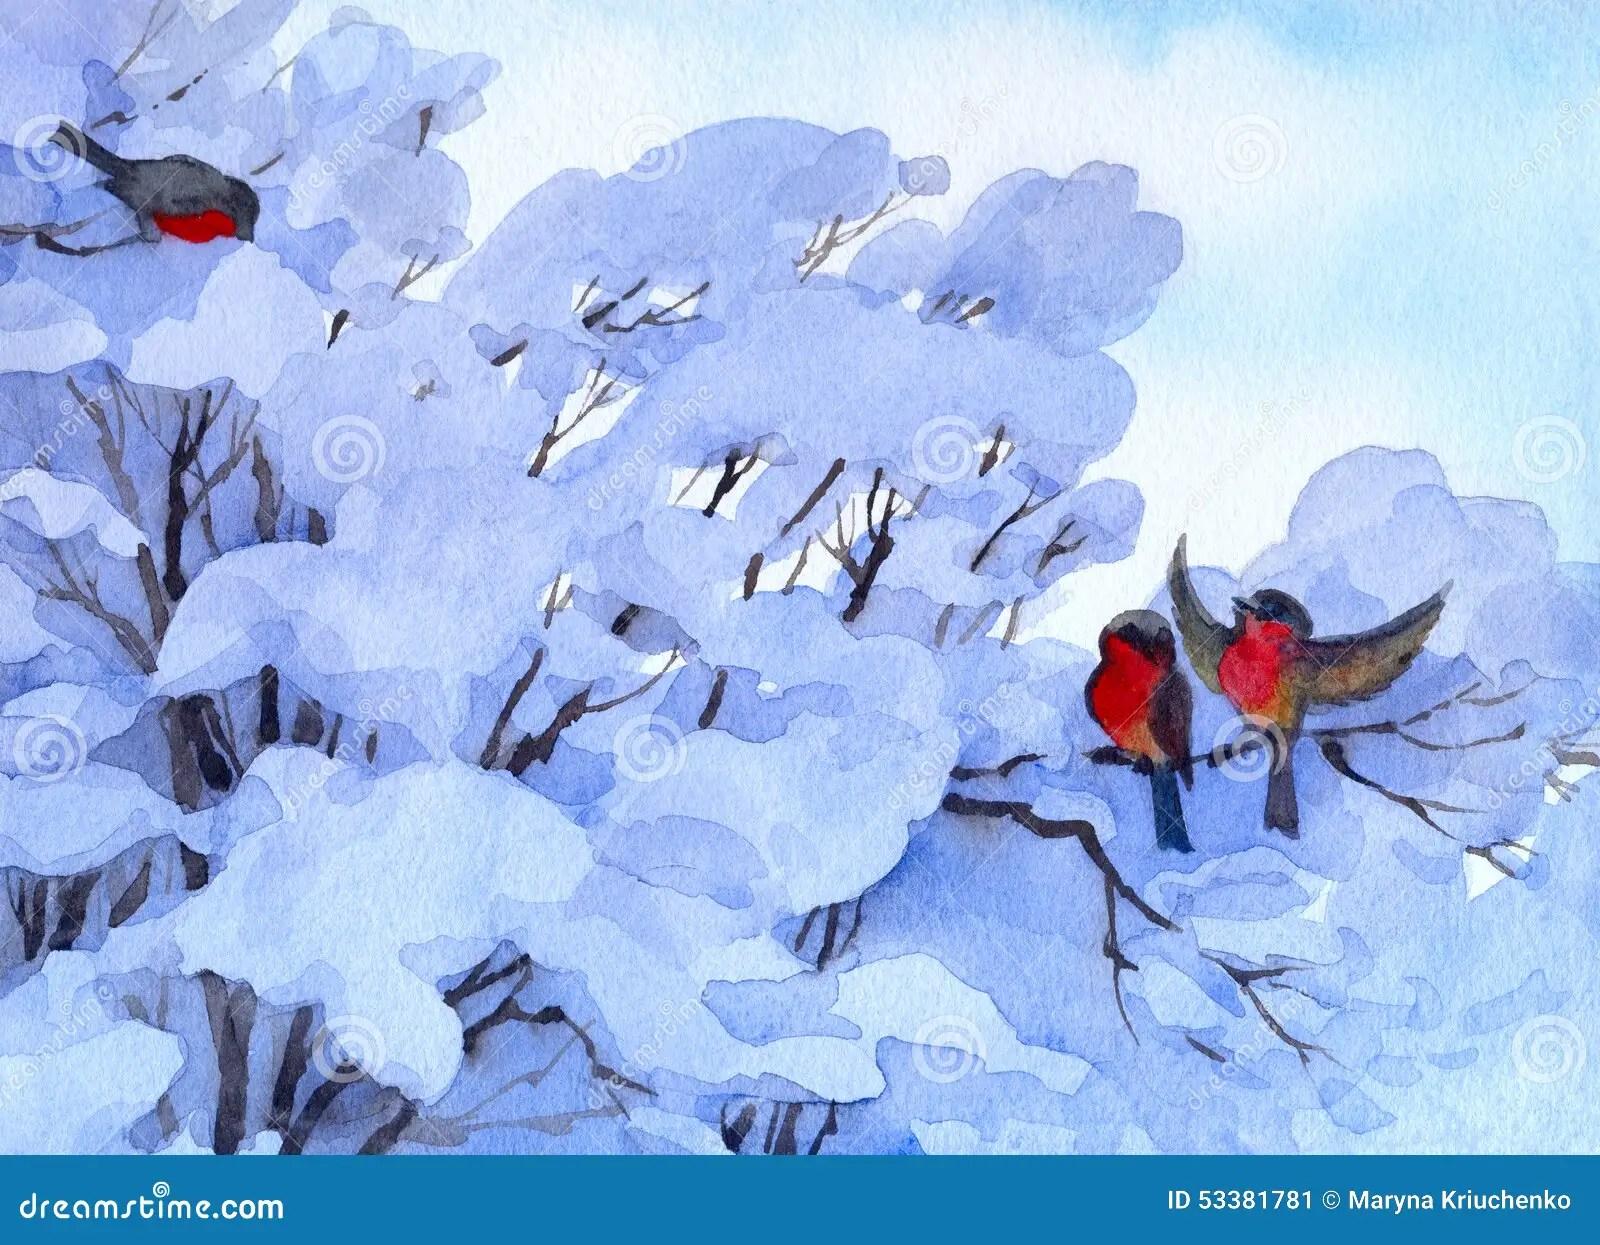 Watercolor Winter Scene Bullfinch Sitting On A Snow